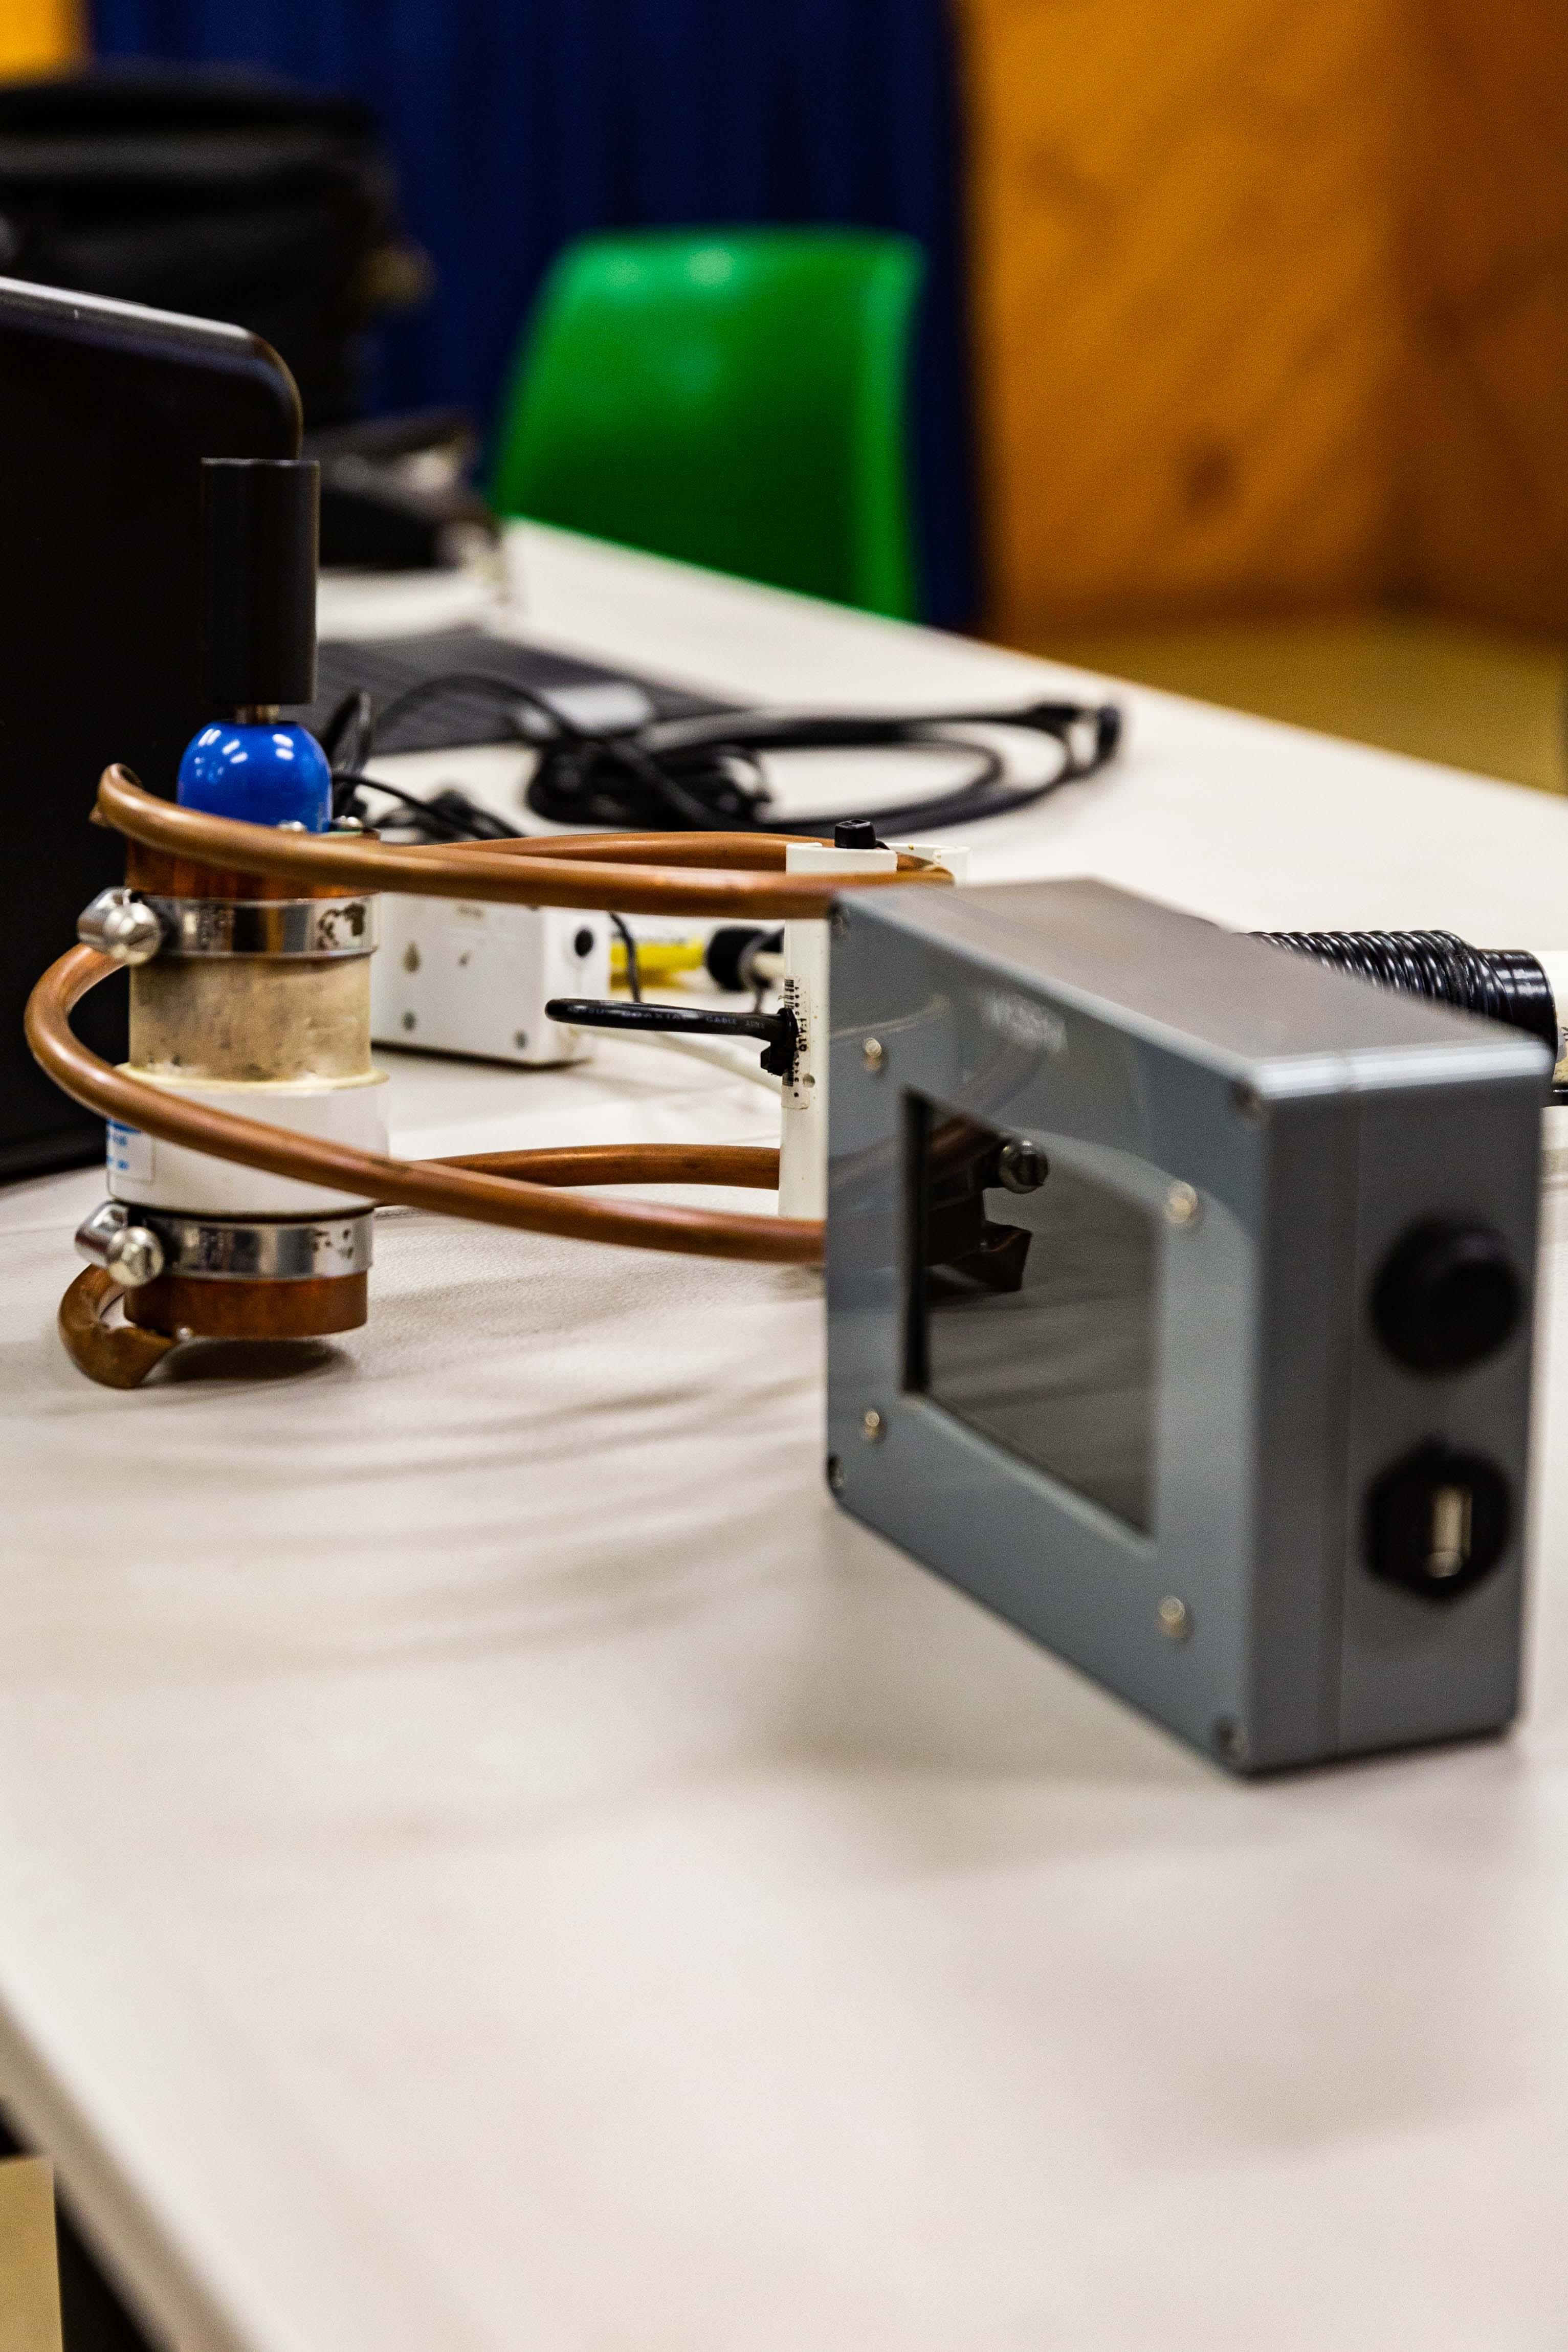 Great Presentation by Steve Adler VK5SFA on Transmitting Magnetic